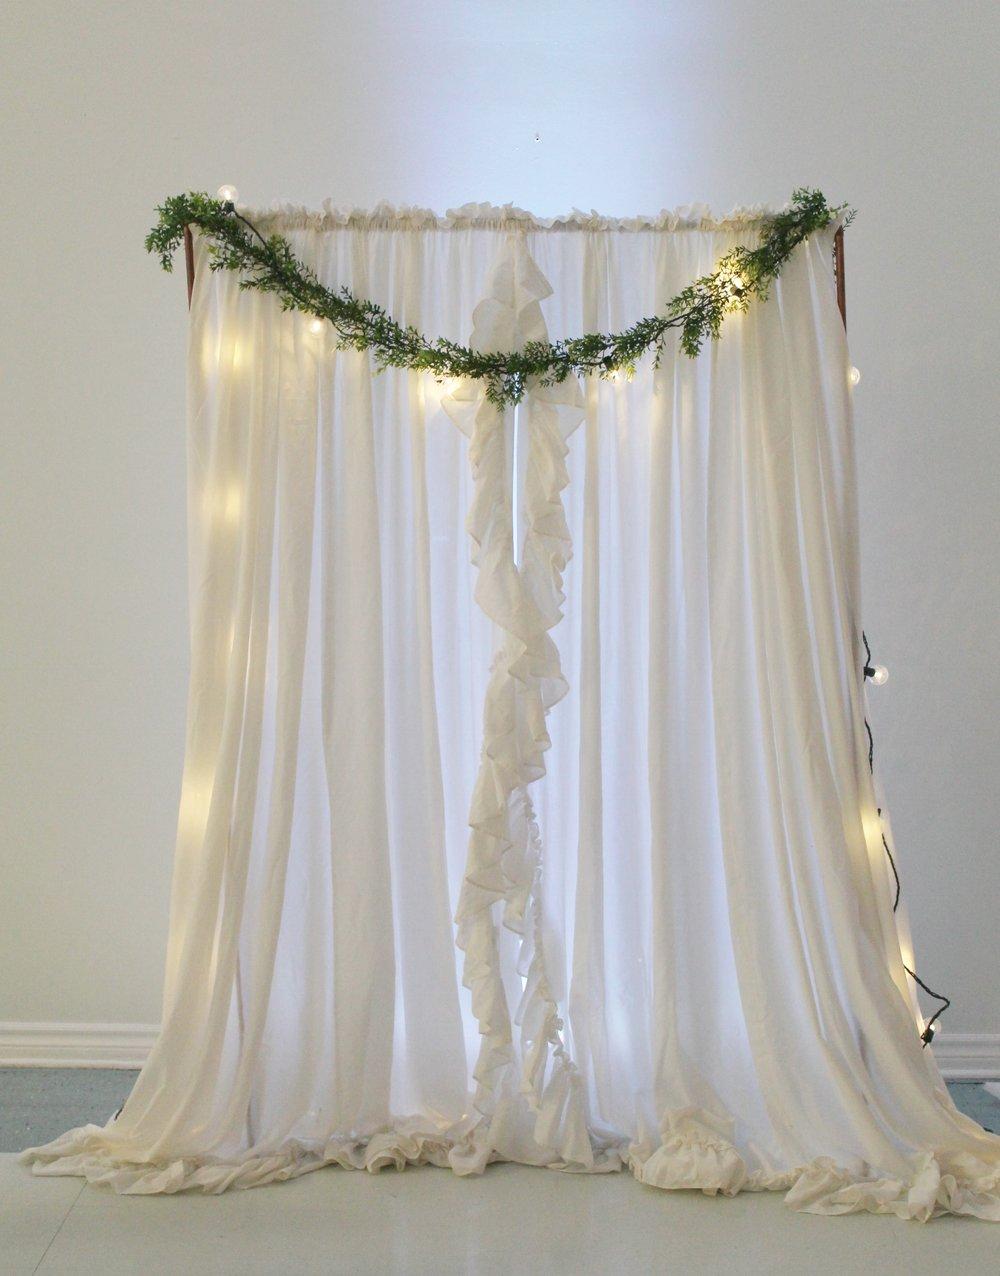 Priscilla Curtains15.00 eachApprox 8.1' W7' LQty: 2 -